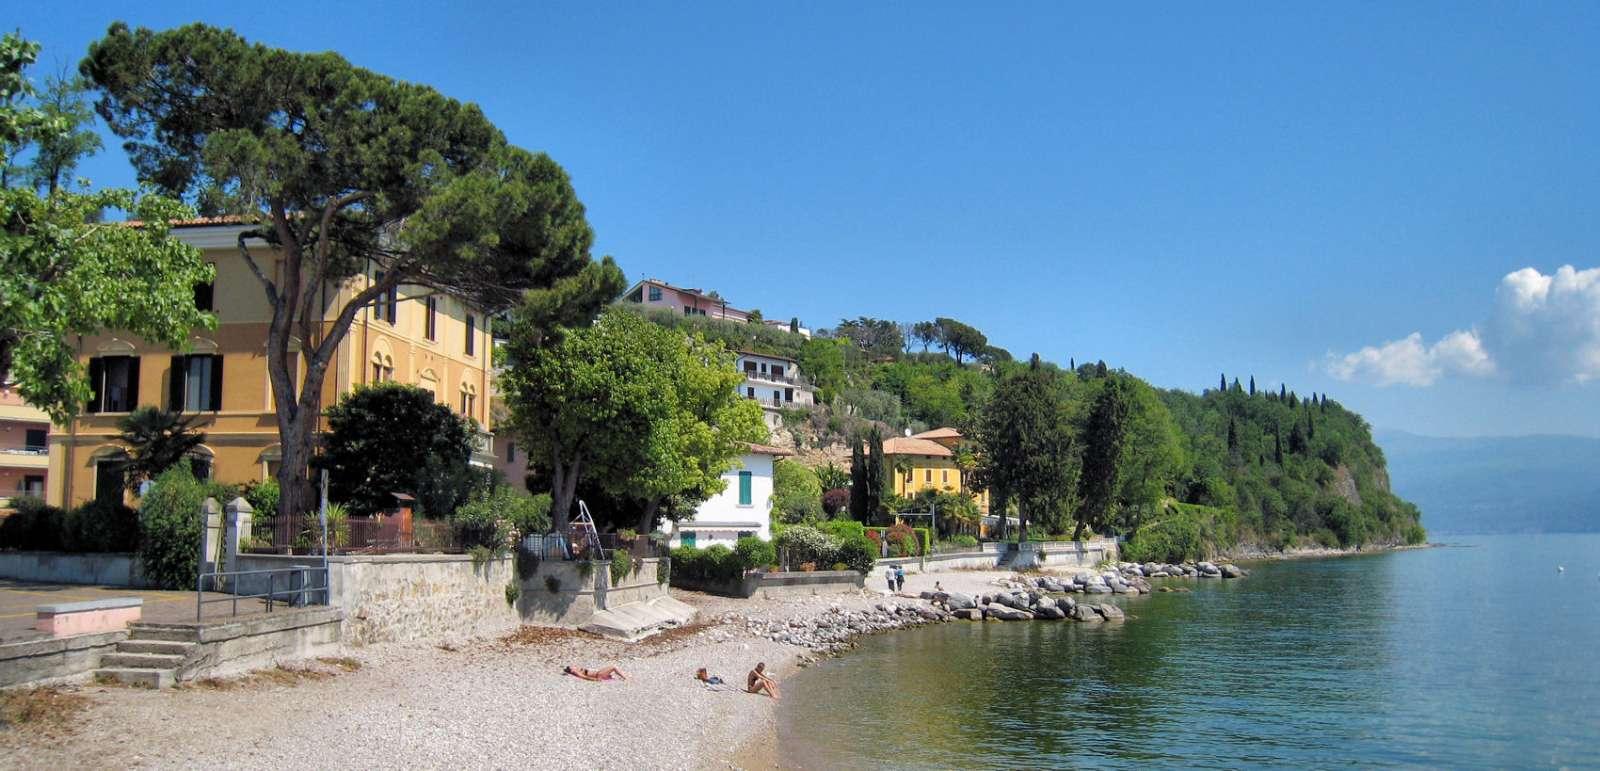 Gardone Riviera på Gardasøens vestlige bred